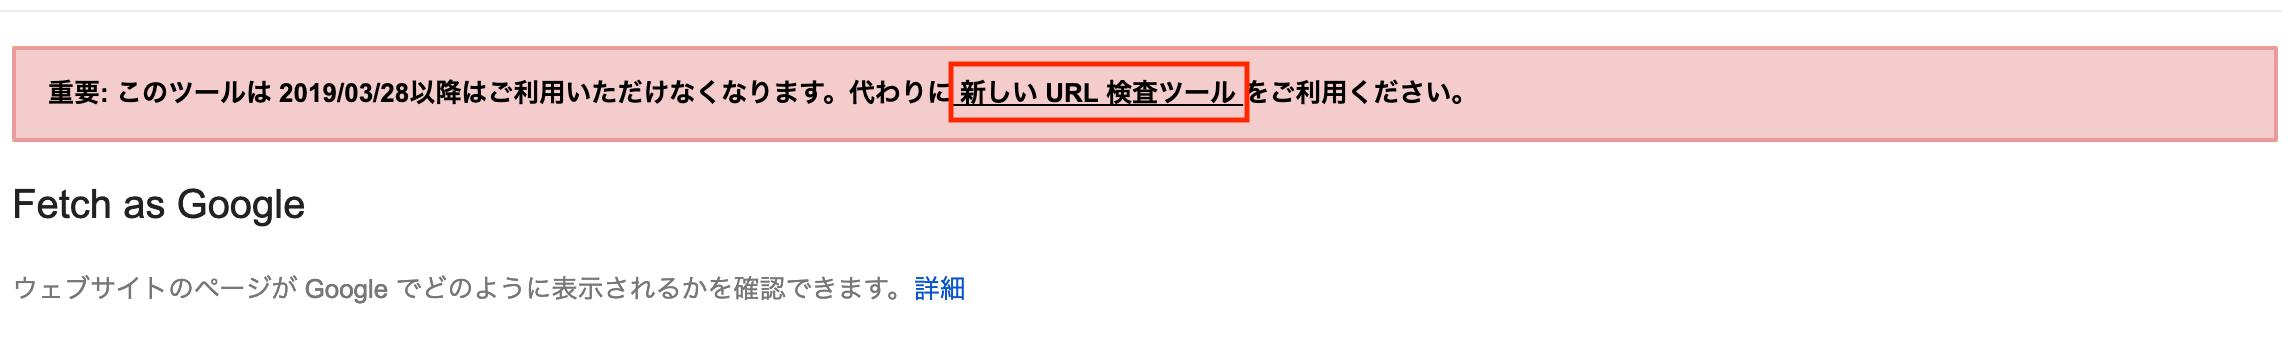 button-only@2x 新しいFetch as Googleの使い方!使えなくなる前に方法マスターしよう!!